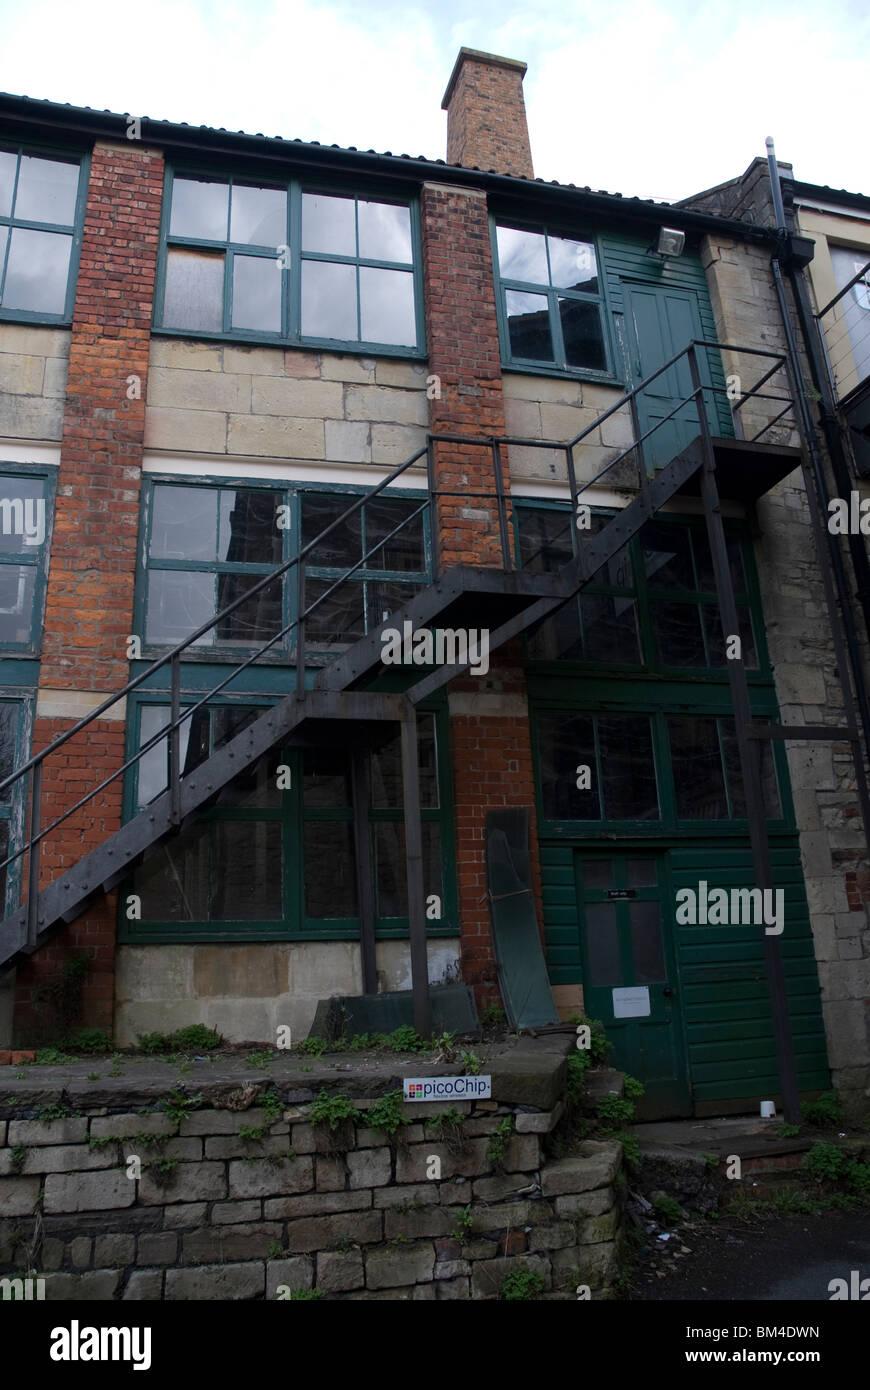 Walcot Reclamation Yard, Bath Spa, Somerset UK Stock Photo, Royalty ...